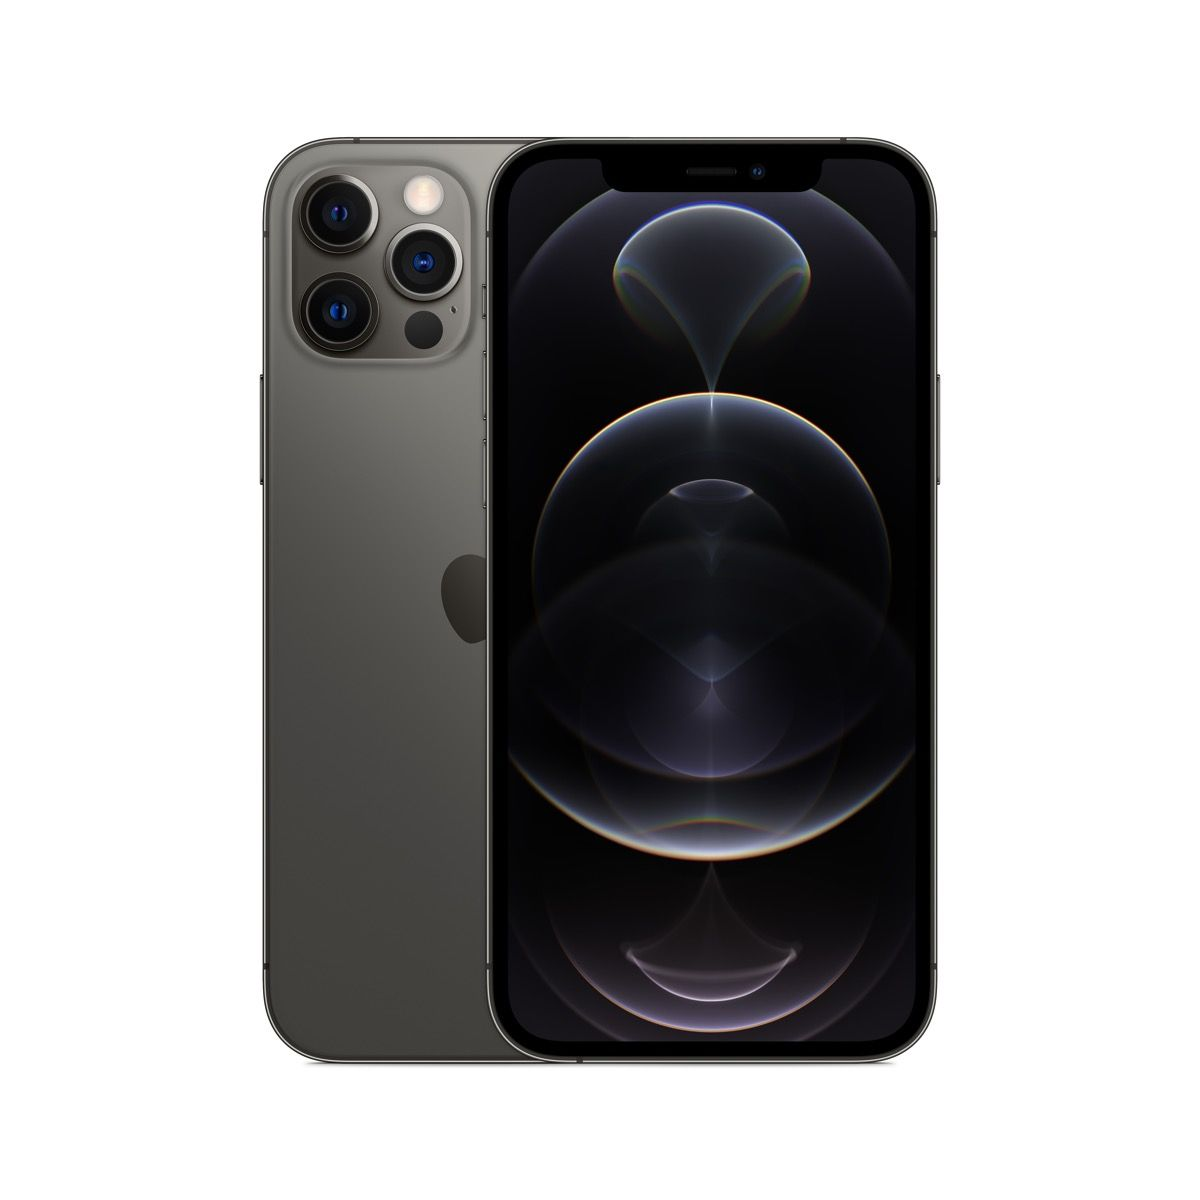 Apple iPhone 12 Pro Max 128GB Graphite / SK